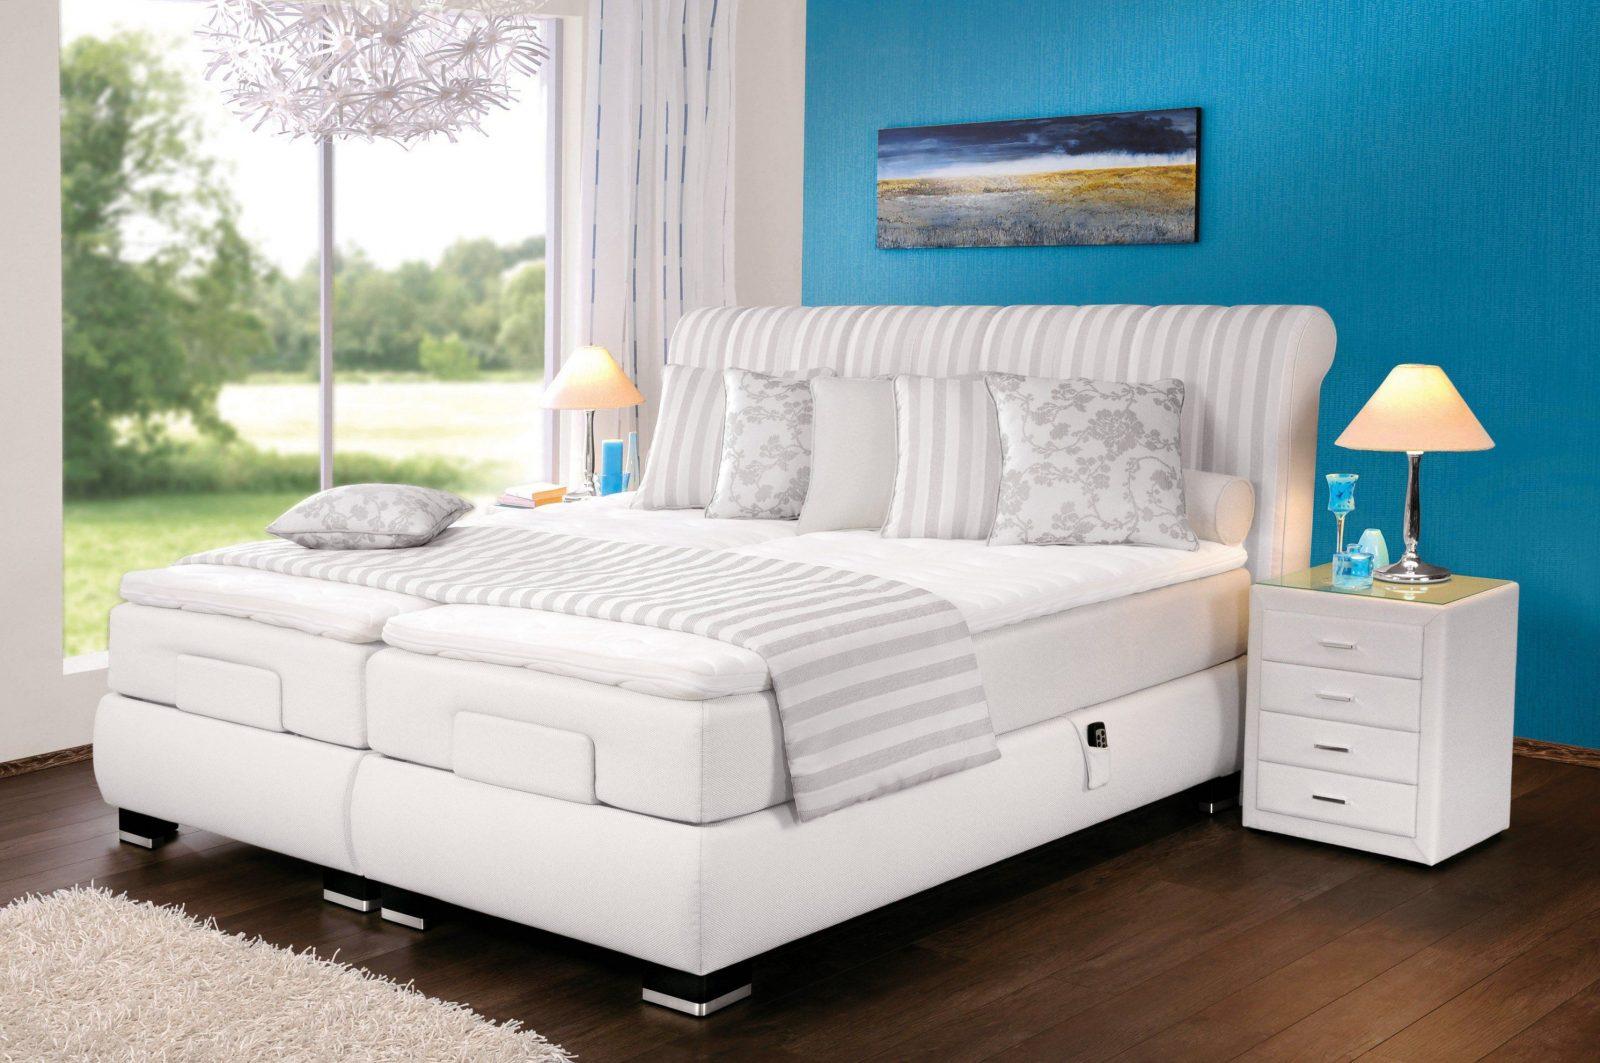 oschmann boxspringbett prestige haus design ideen. Black Bedroom Furniture Sets. Home Design Ideas